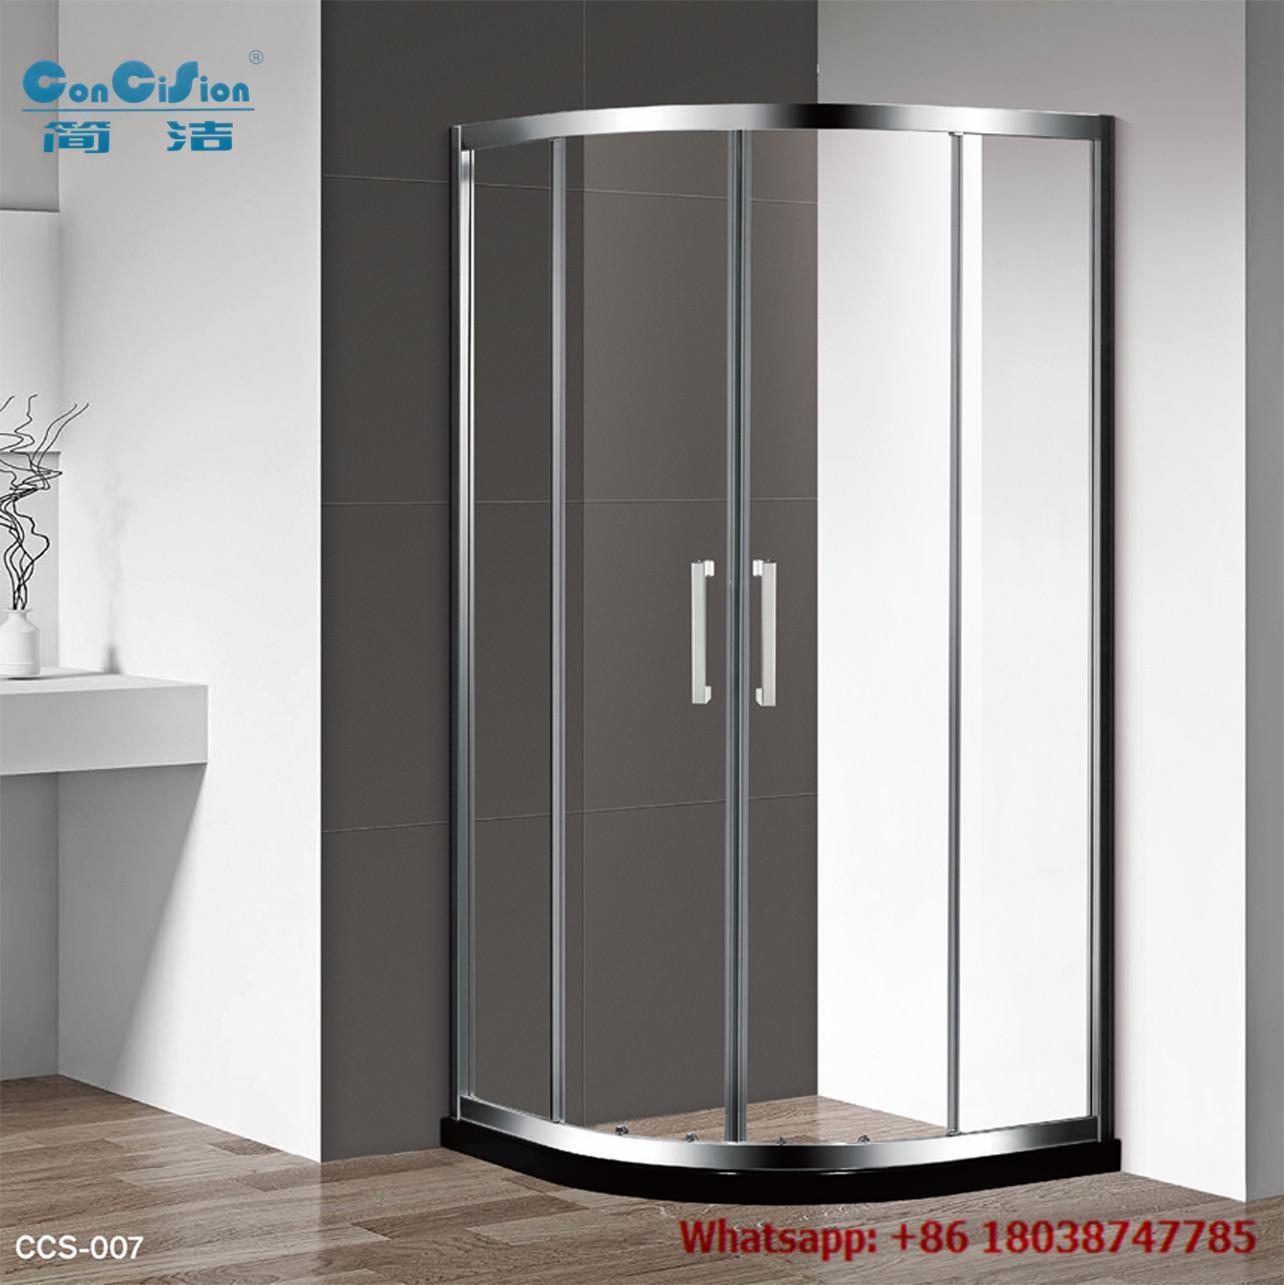 Aluminium hot sell tempered glass shower enclosure shower cabin 1